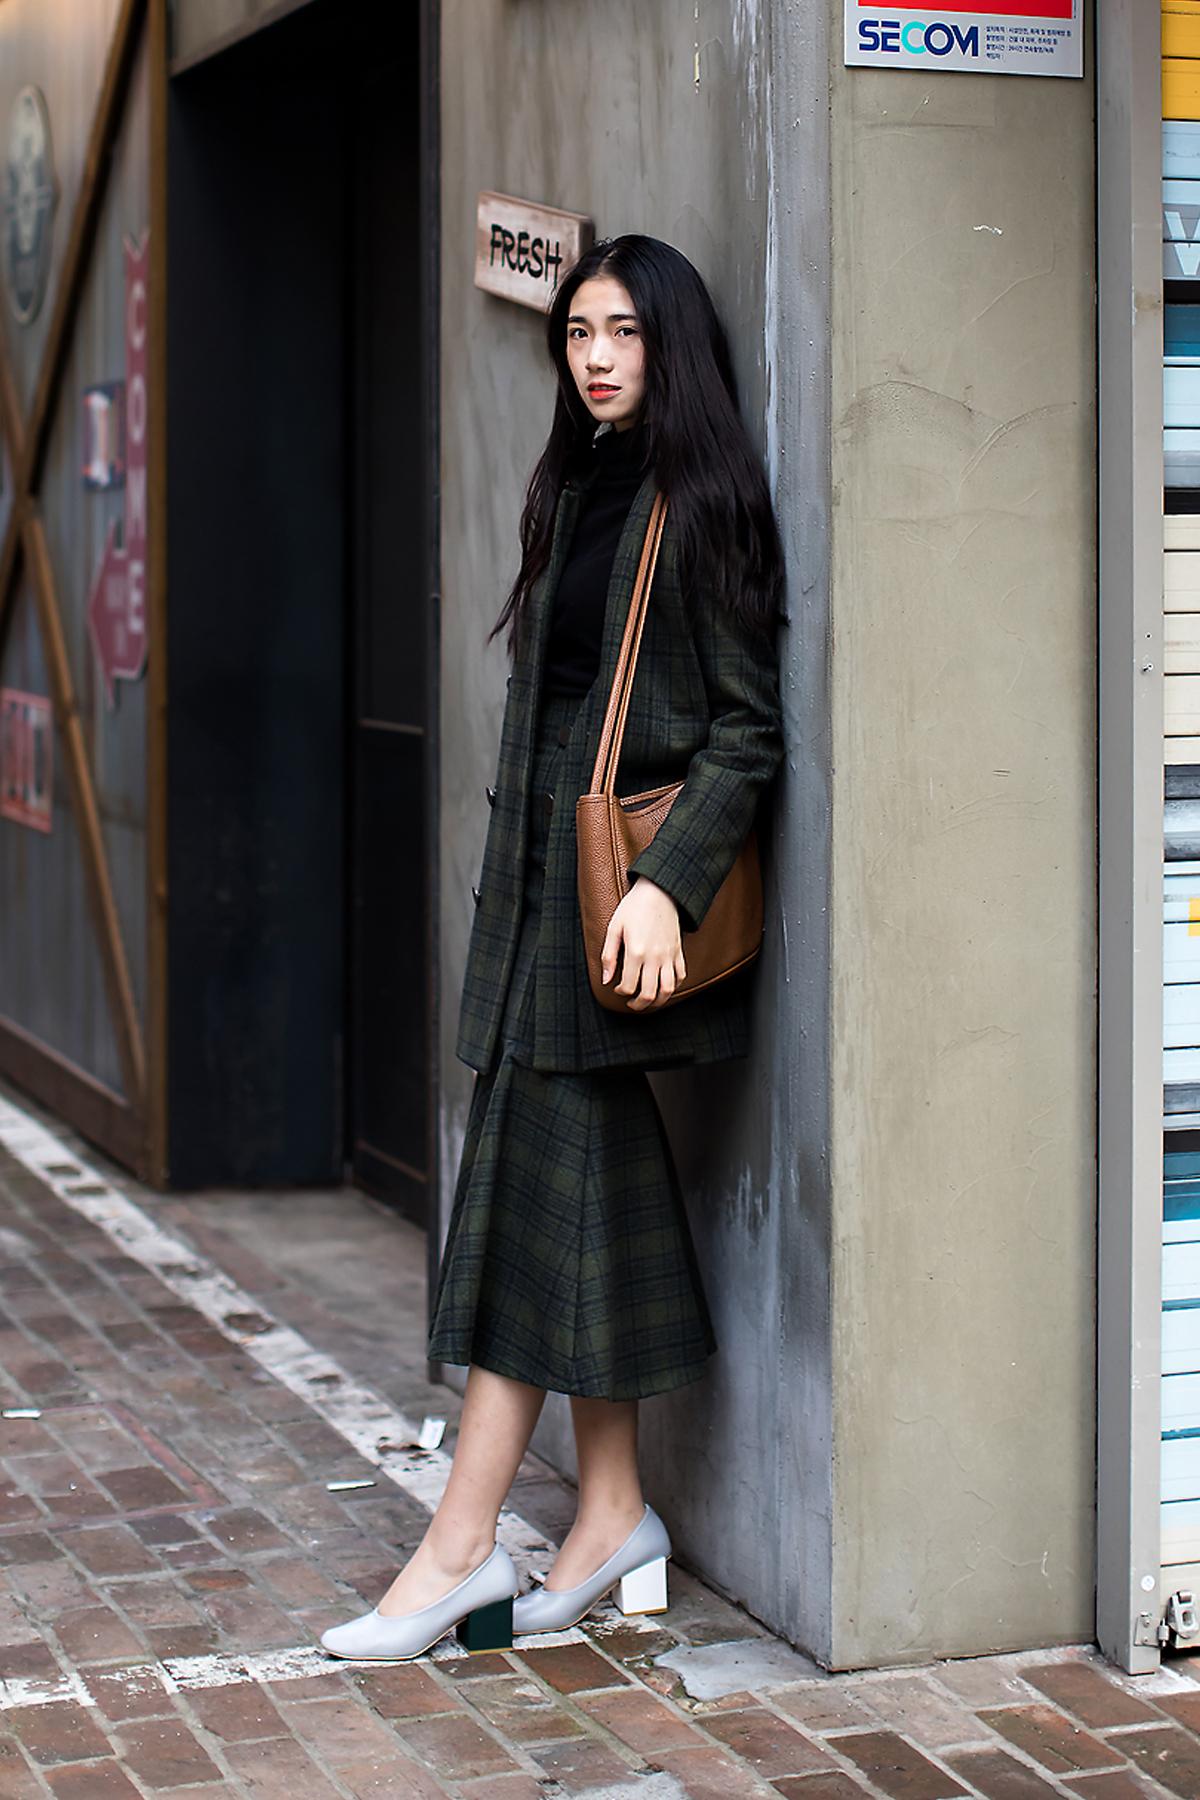 hujingyi-street-fashion-2017-in-seoul